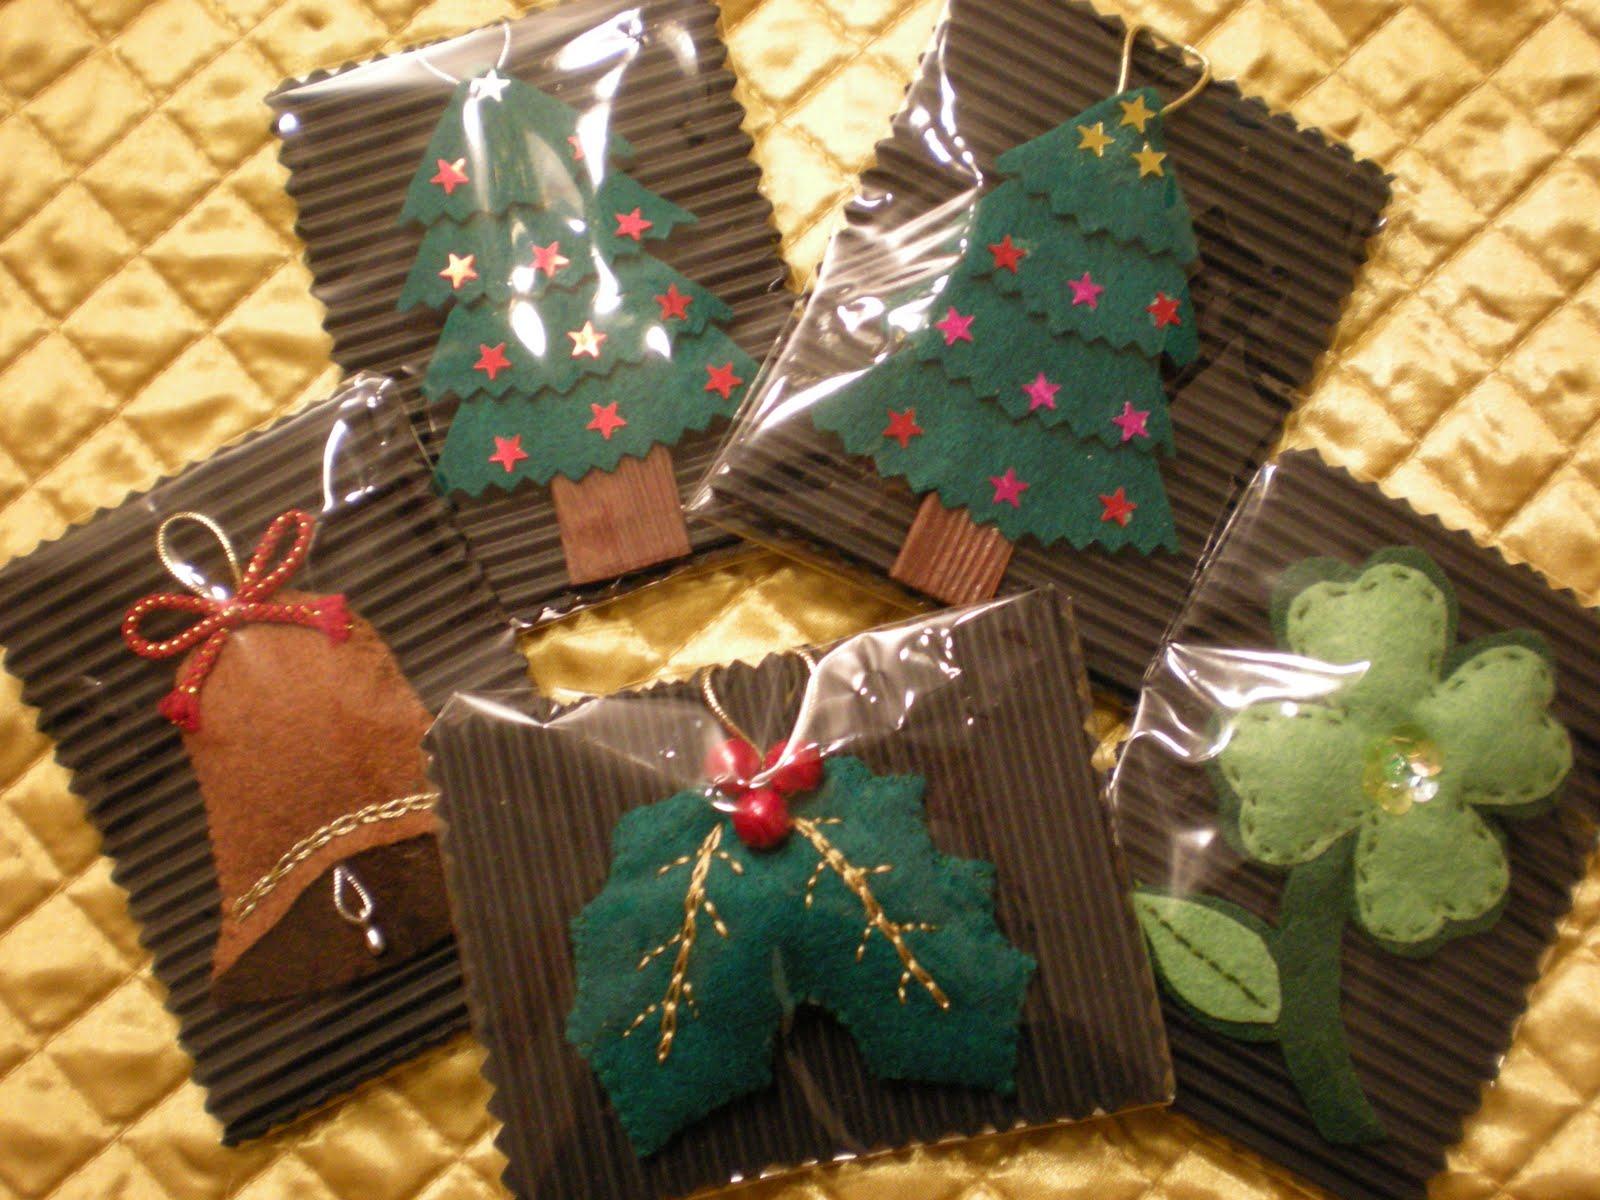 Mis filigranas detalles para regalar en navidad for Detalles de navidad